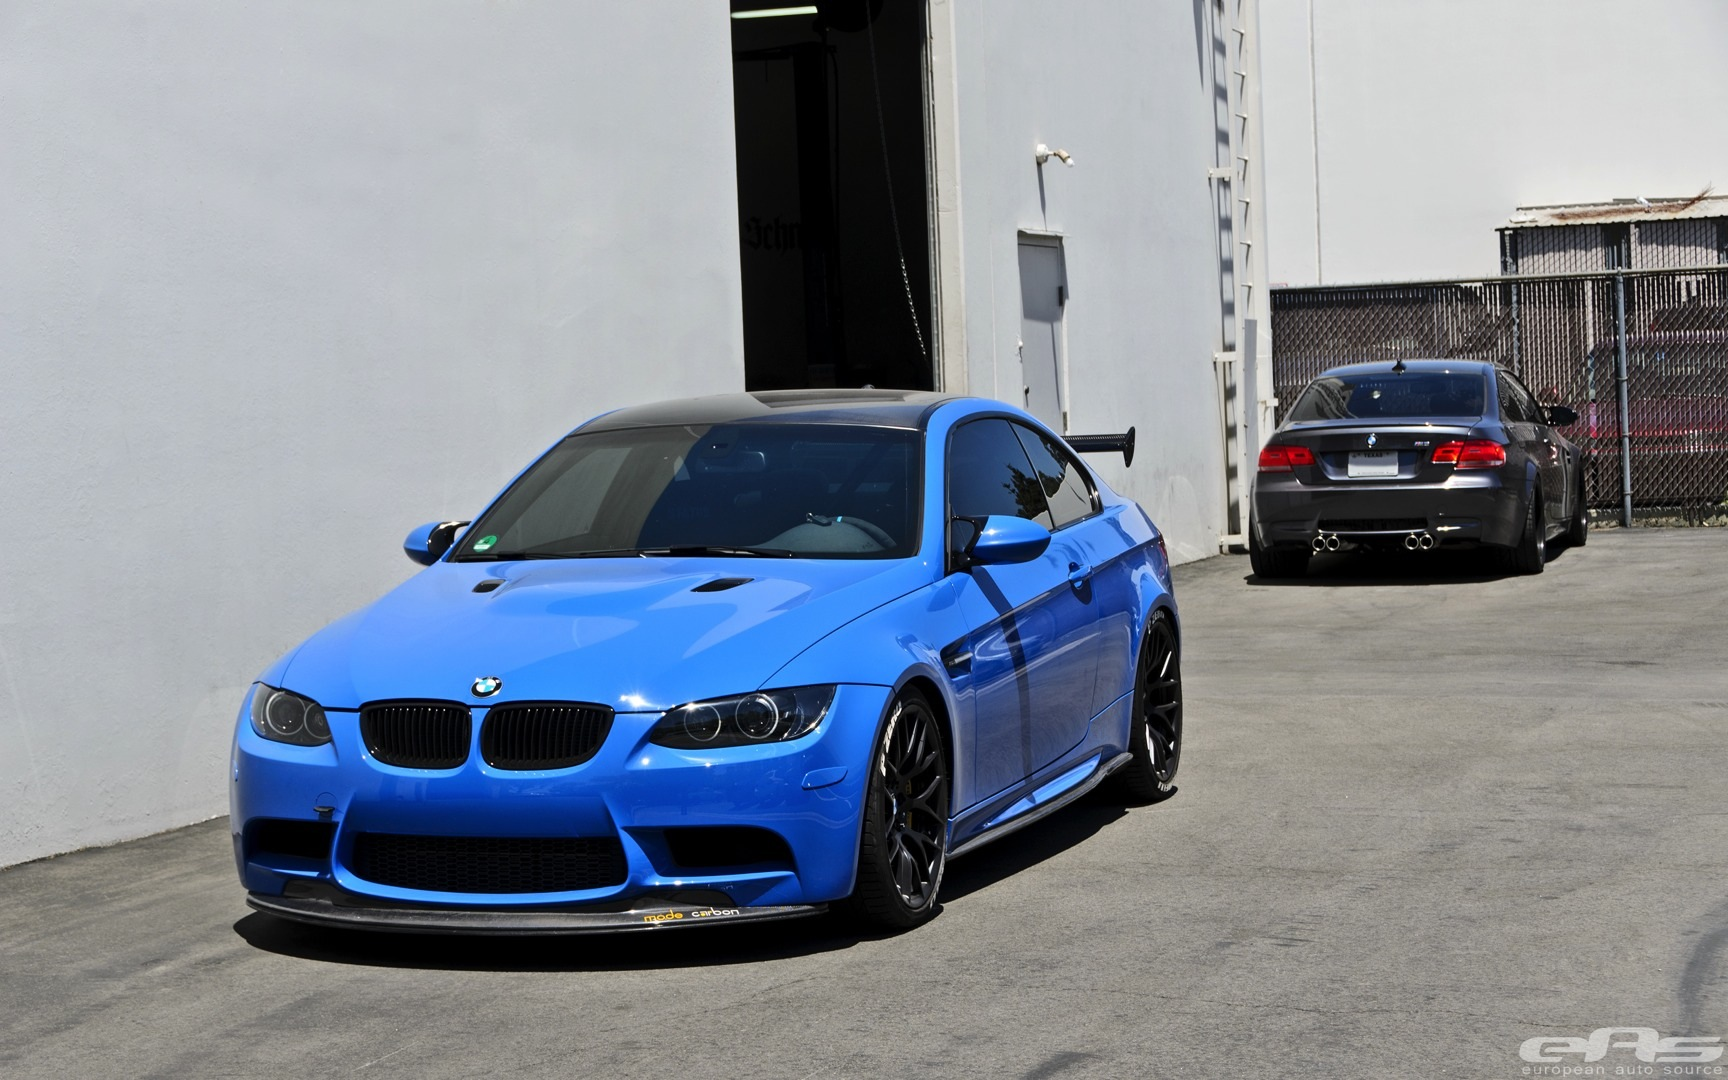 Paul Walker Blue Car Wallpaper Santorini Blue Bmw E92 M3 Gets Serious At Eas Autoevolution